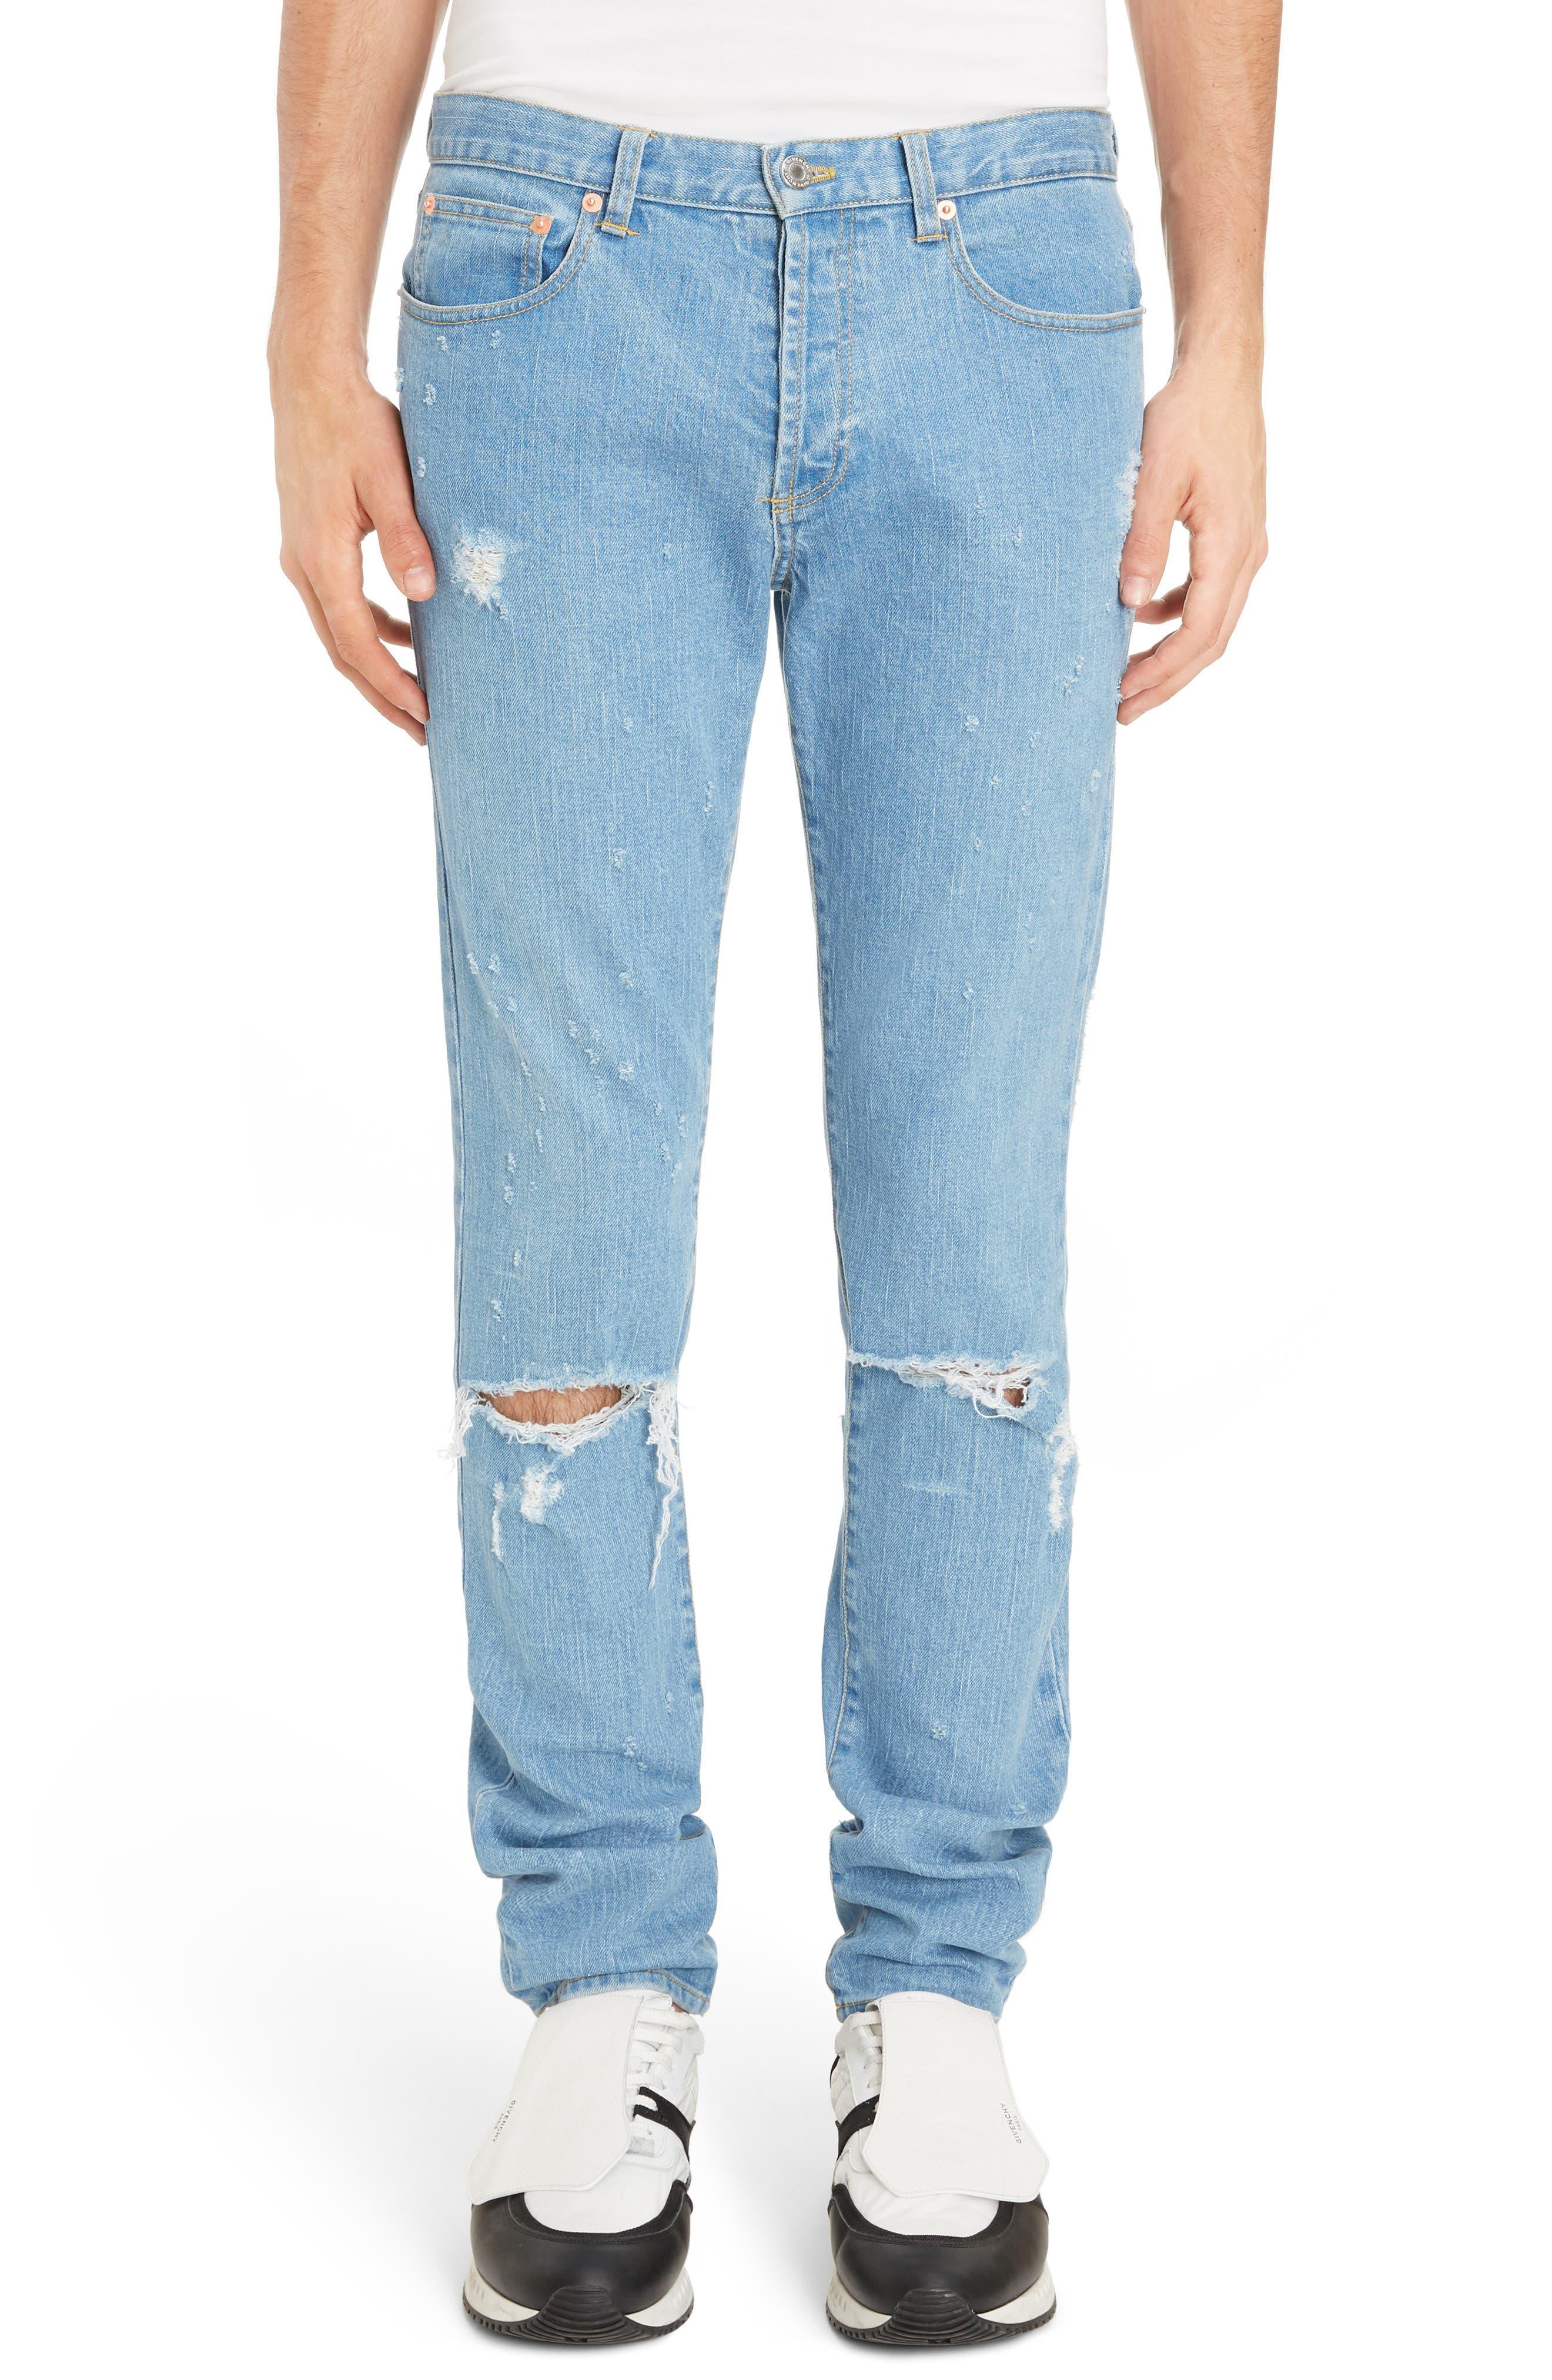 Rico Fit Jeans,                             Main thumbnail 1, color,                             Medium Blue